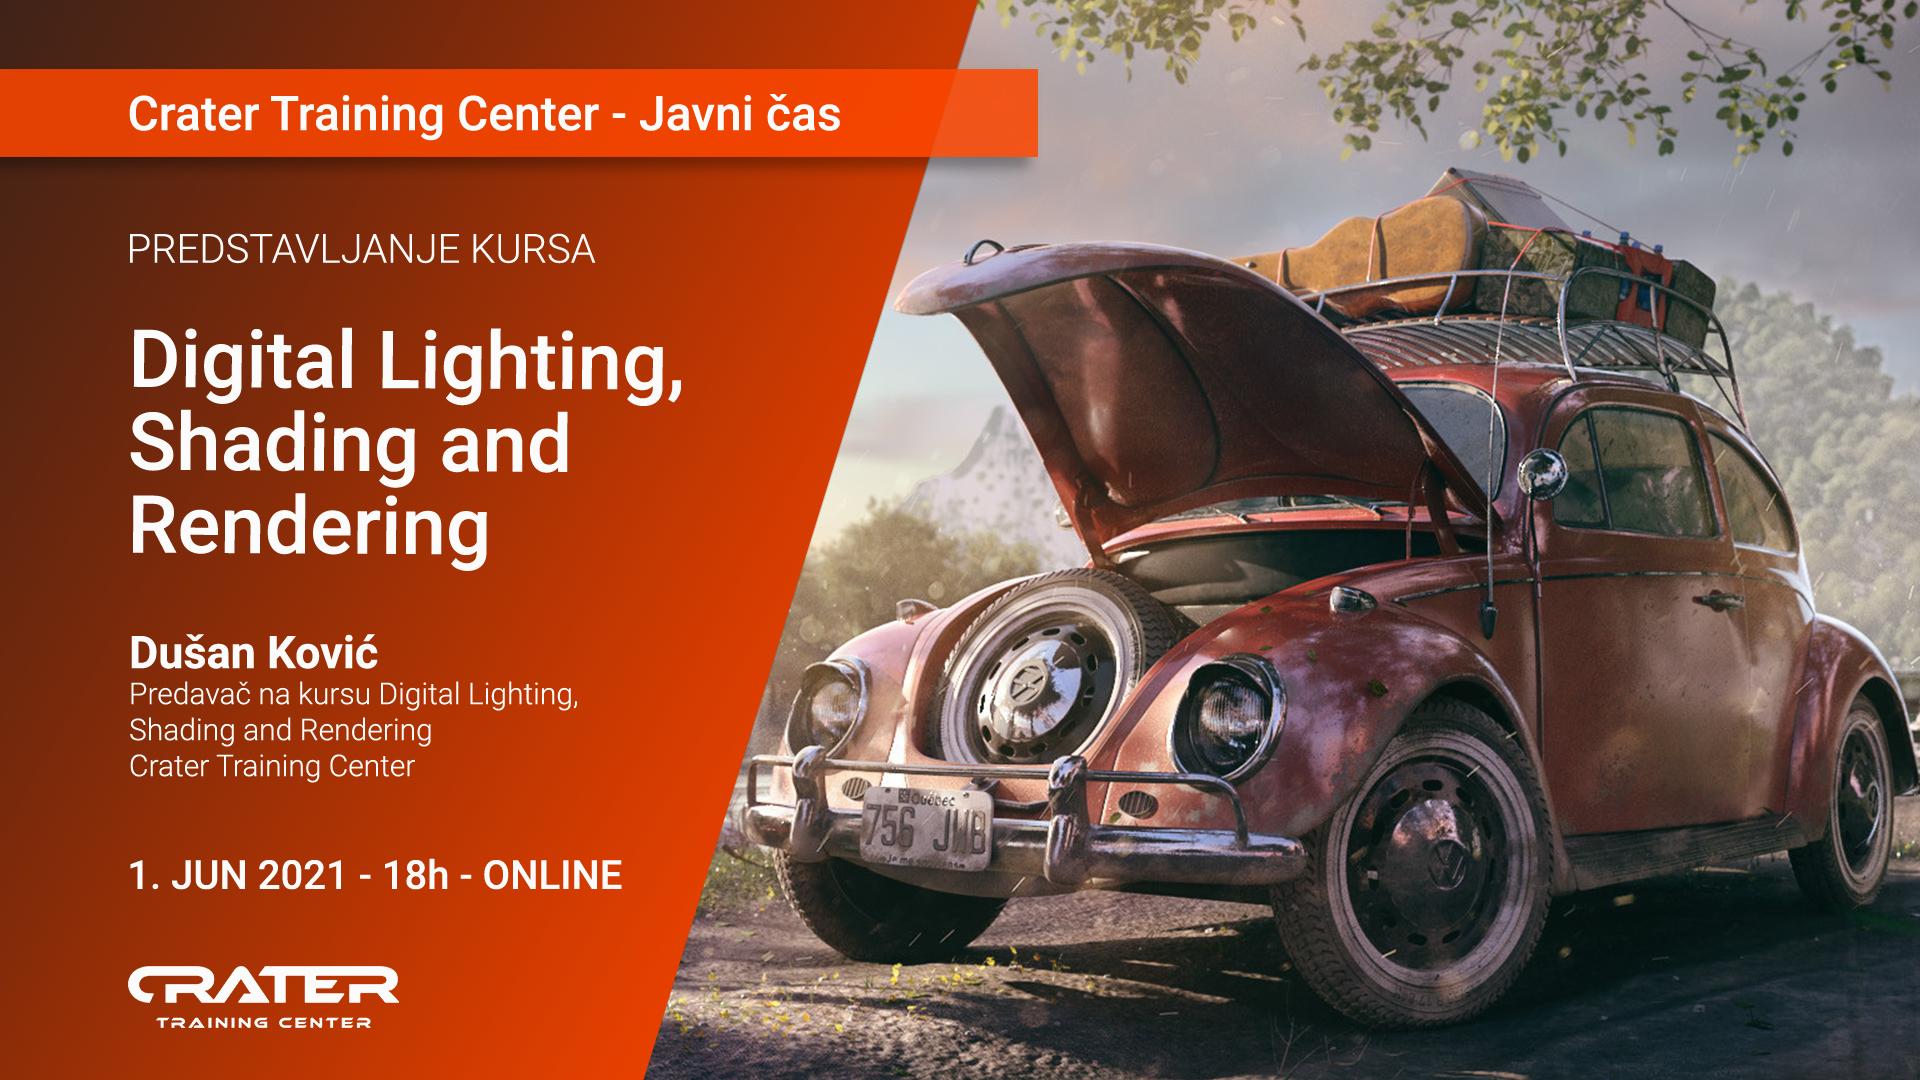 javni-cas-digital-Lightning-shading-rendering